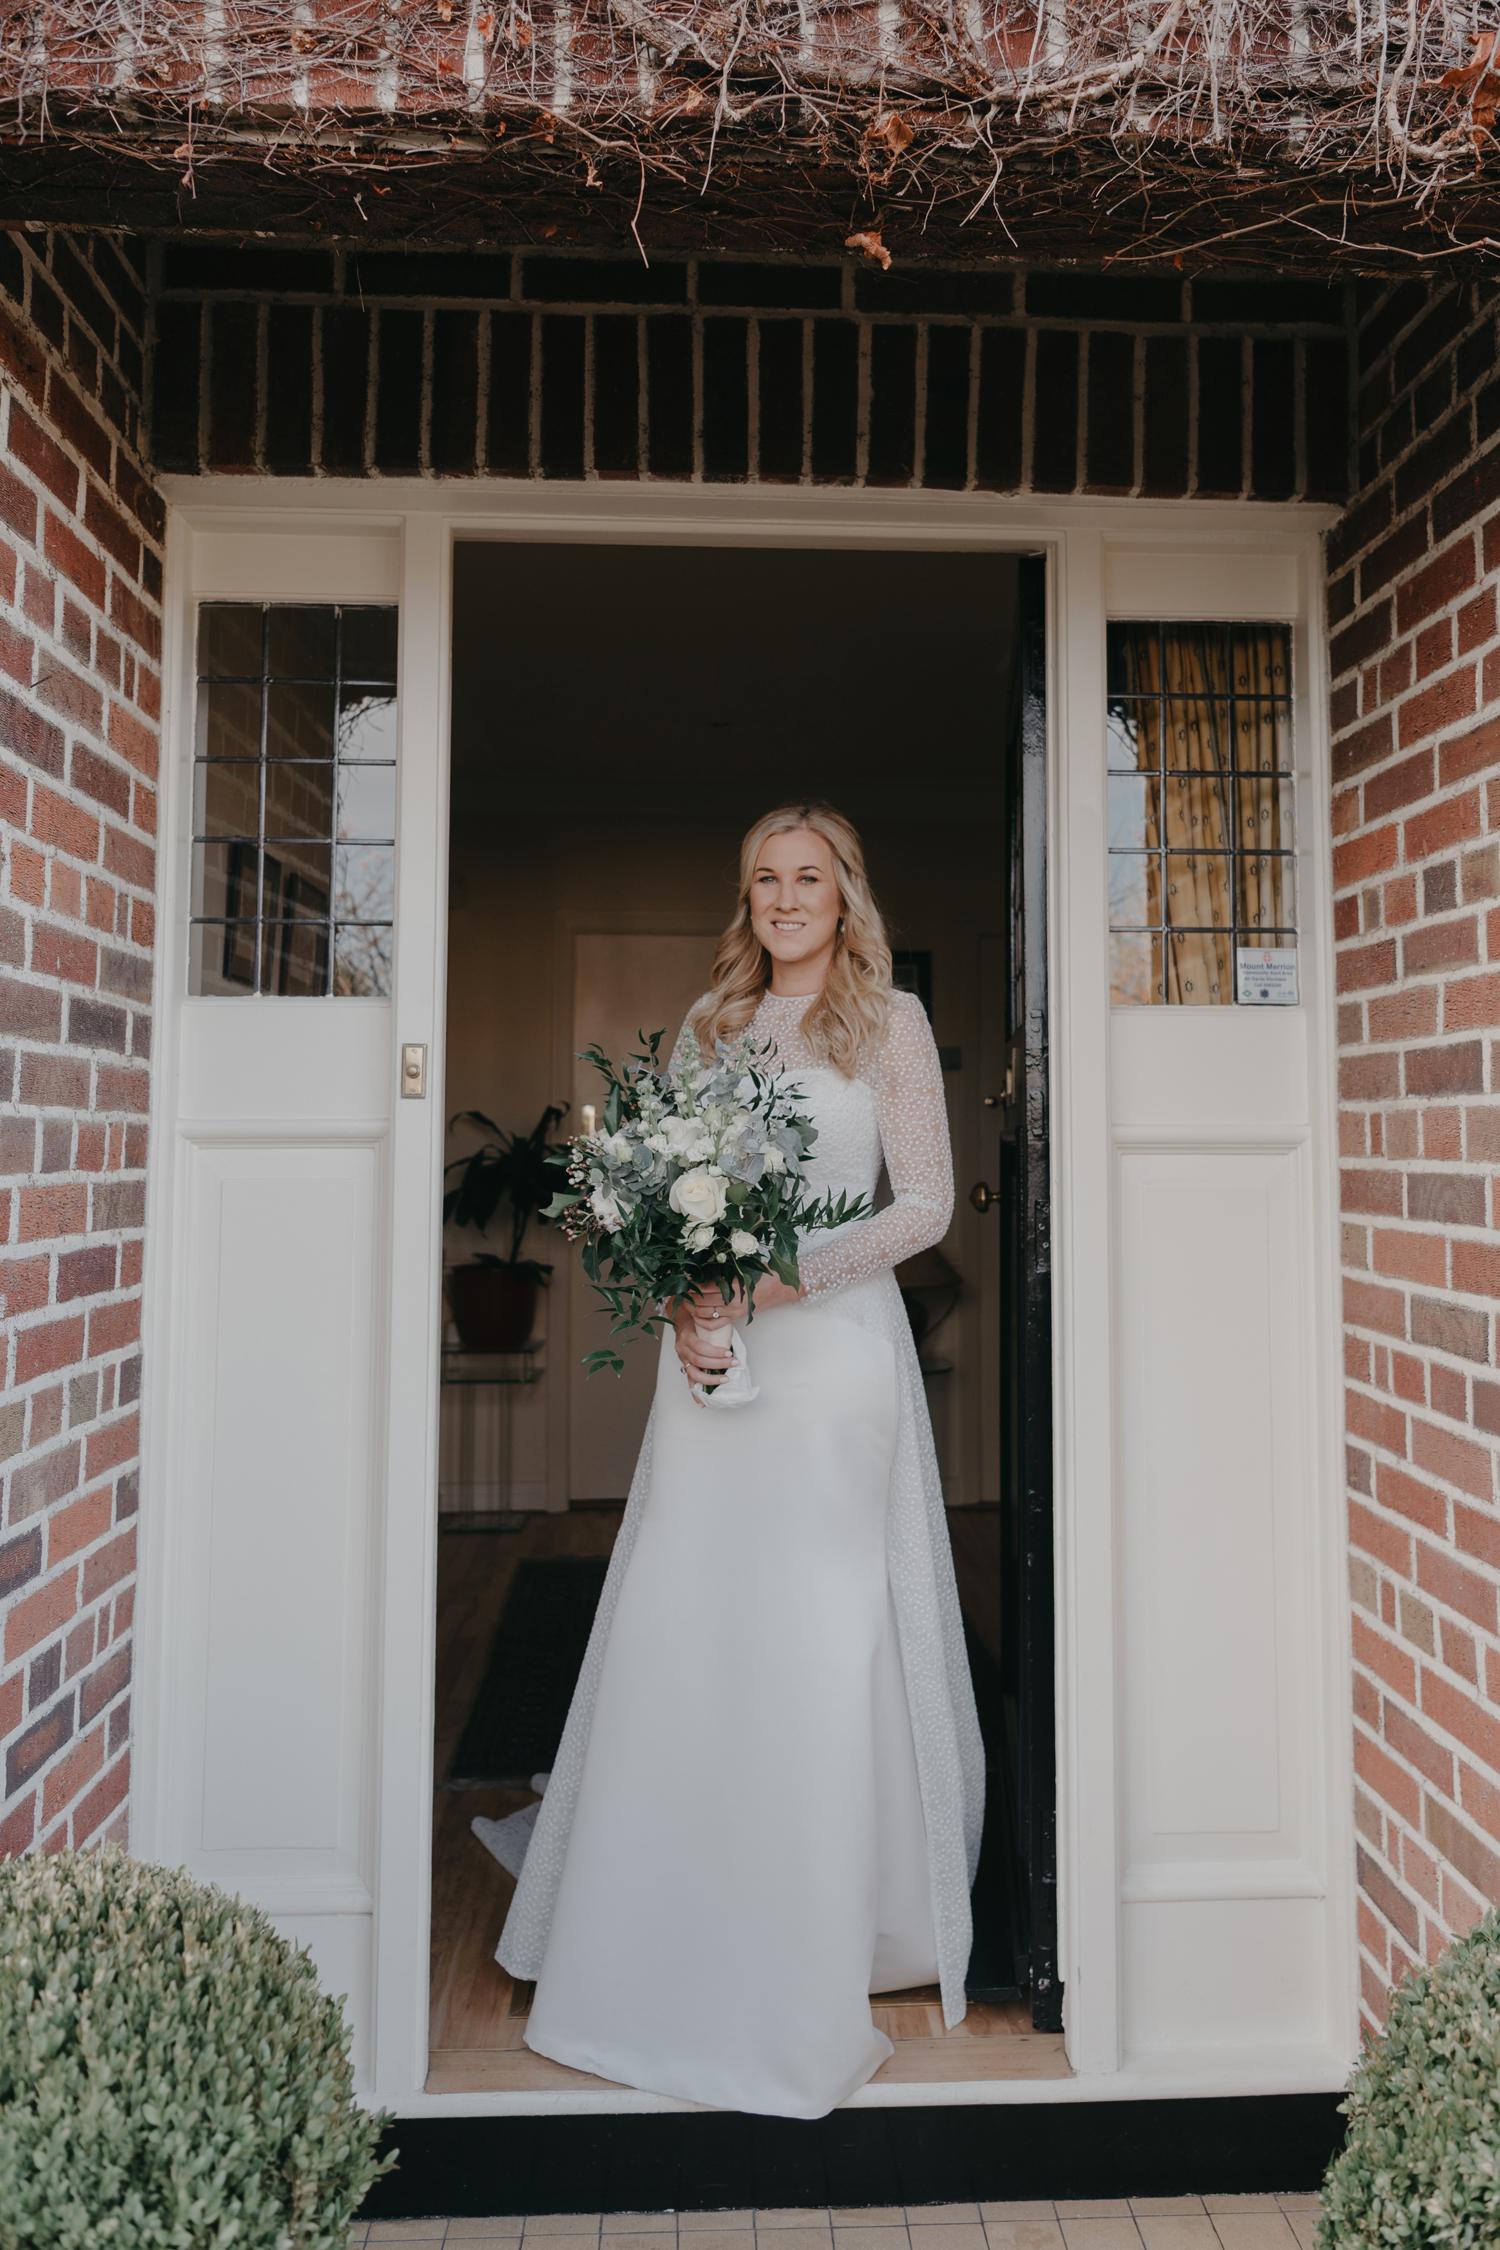 clonwilliam-house-wedding-photographer-048.jpg